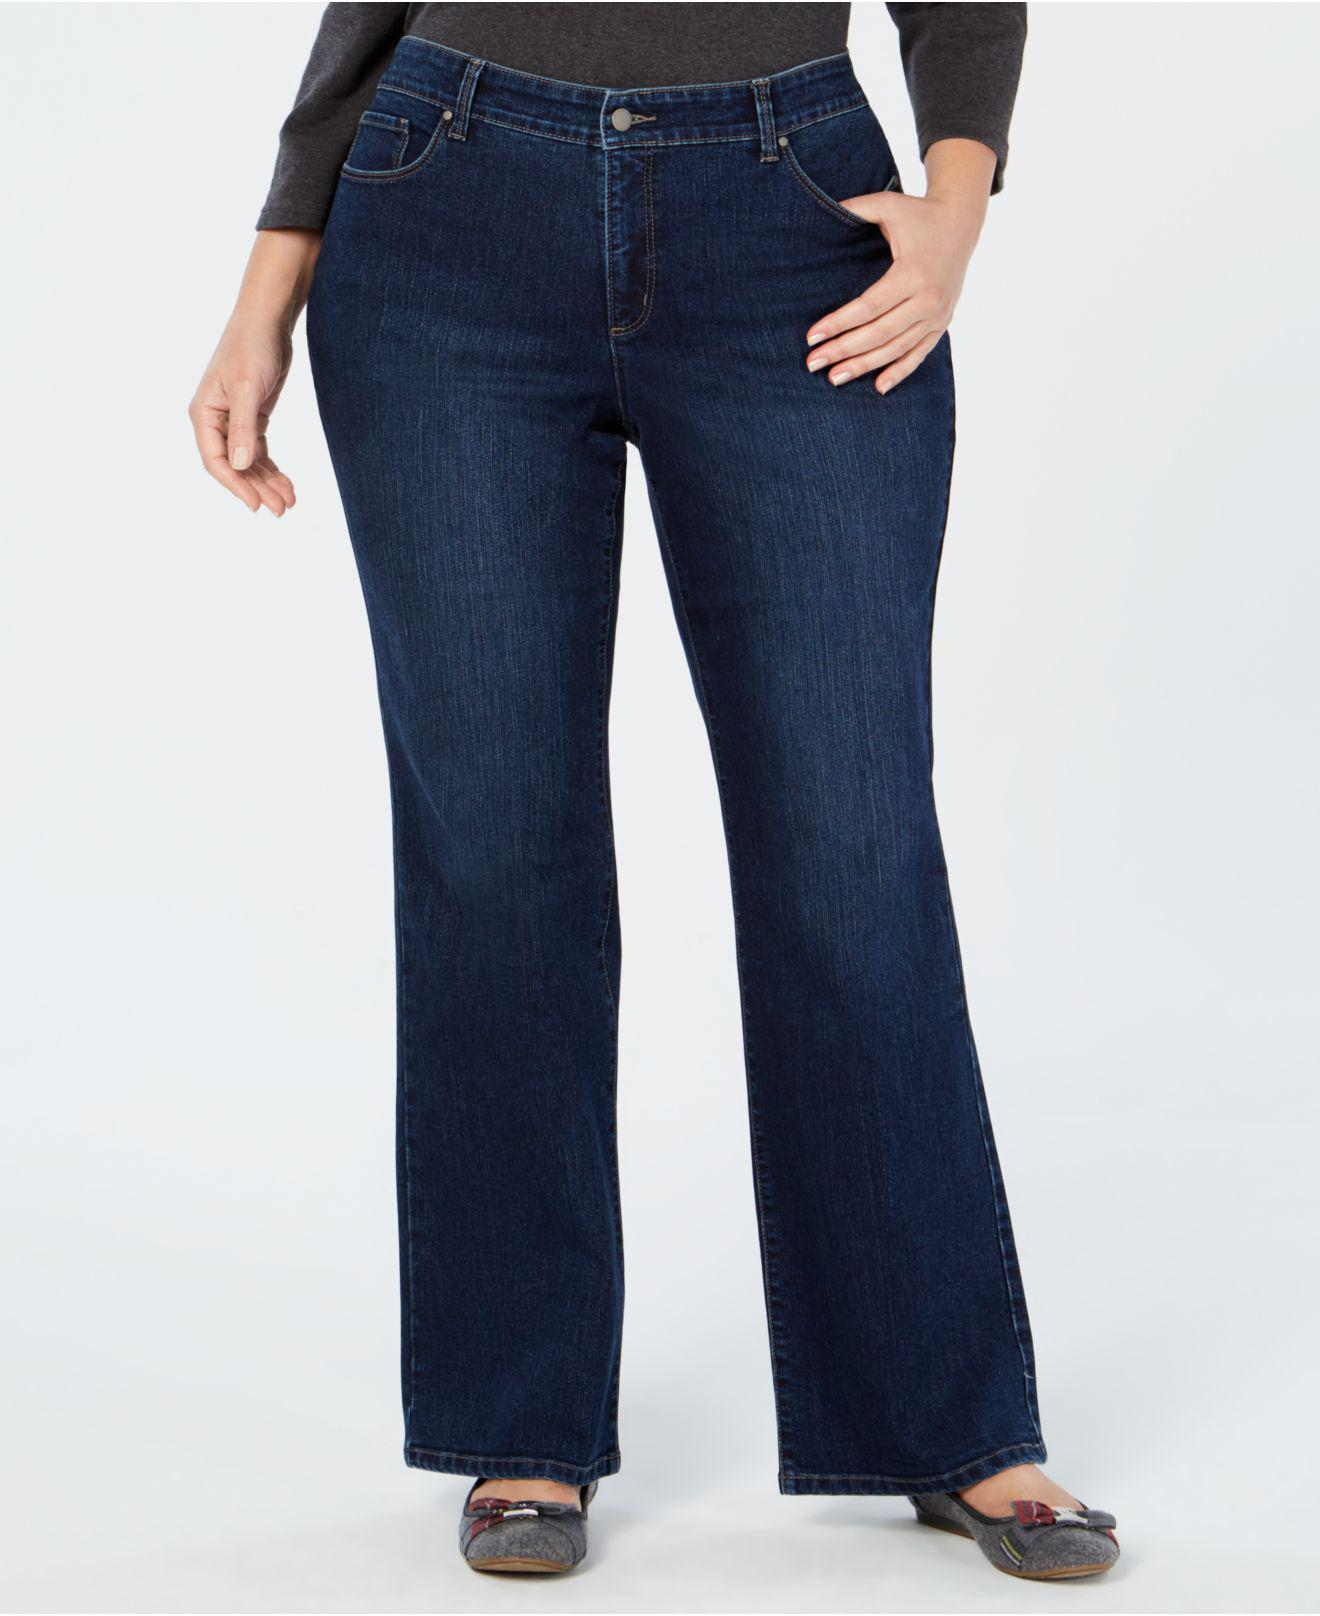 6f0d8e7f240 Charter Club. Women s Blue Plus Size Prescott Tummy-control Bootcut Jeans  ...